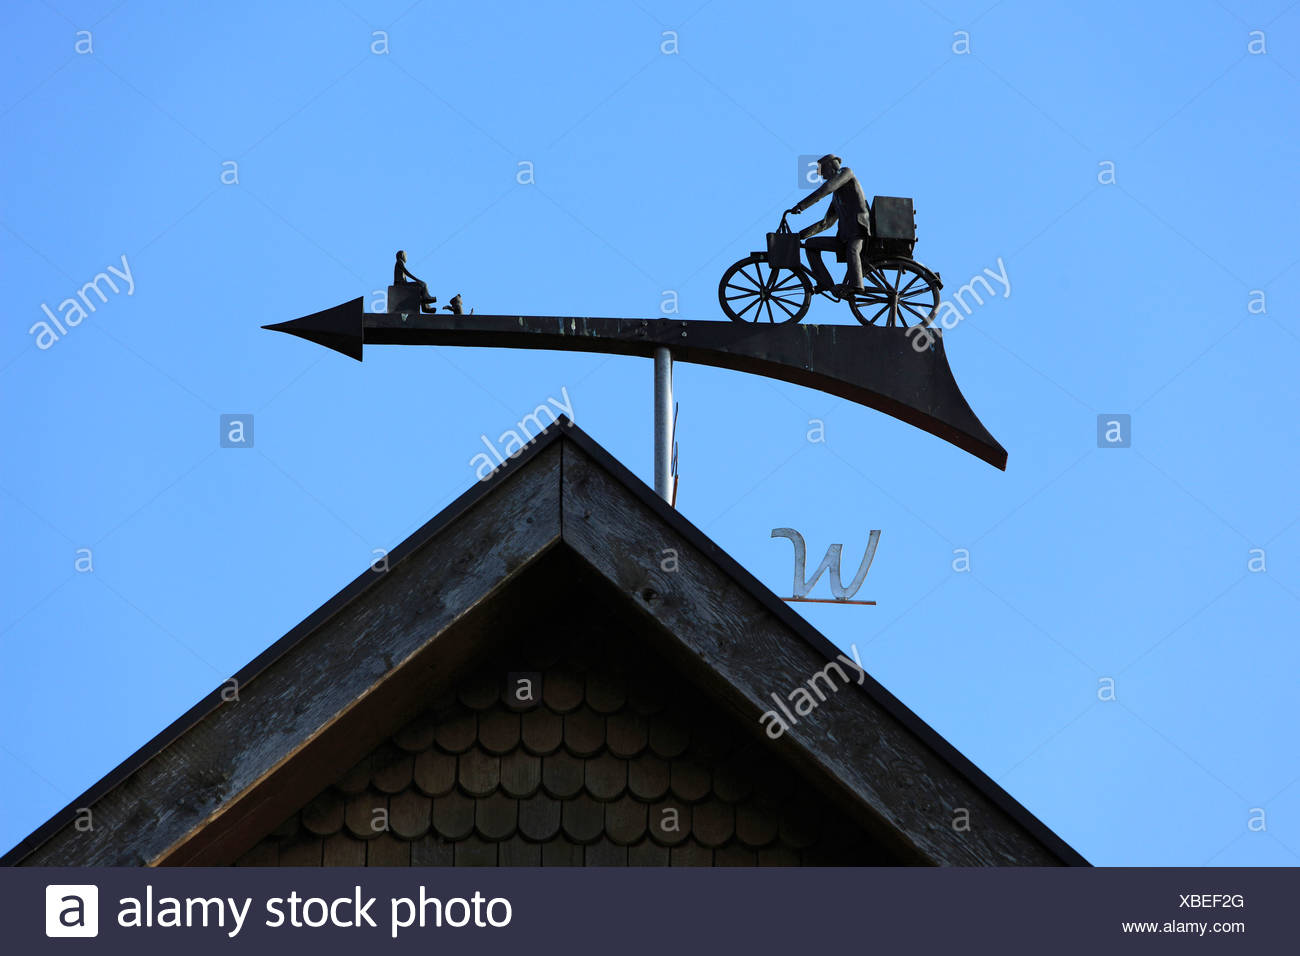 Wind direction, indicator, house roof, Essen, Oldenburg, Oldenburger Munsterland, Lower Saxony, Germany, Europe, arrow, wind - Stock Image